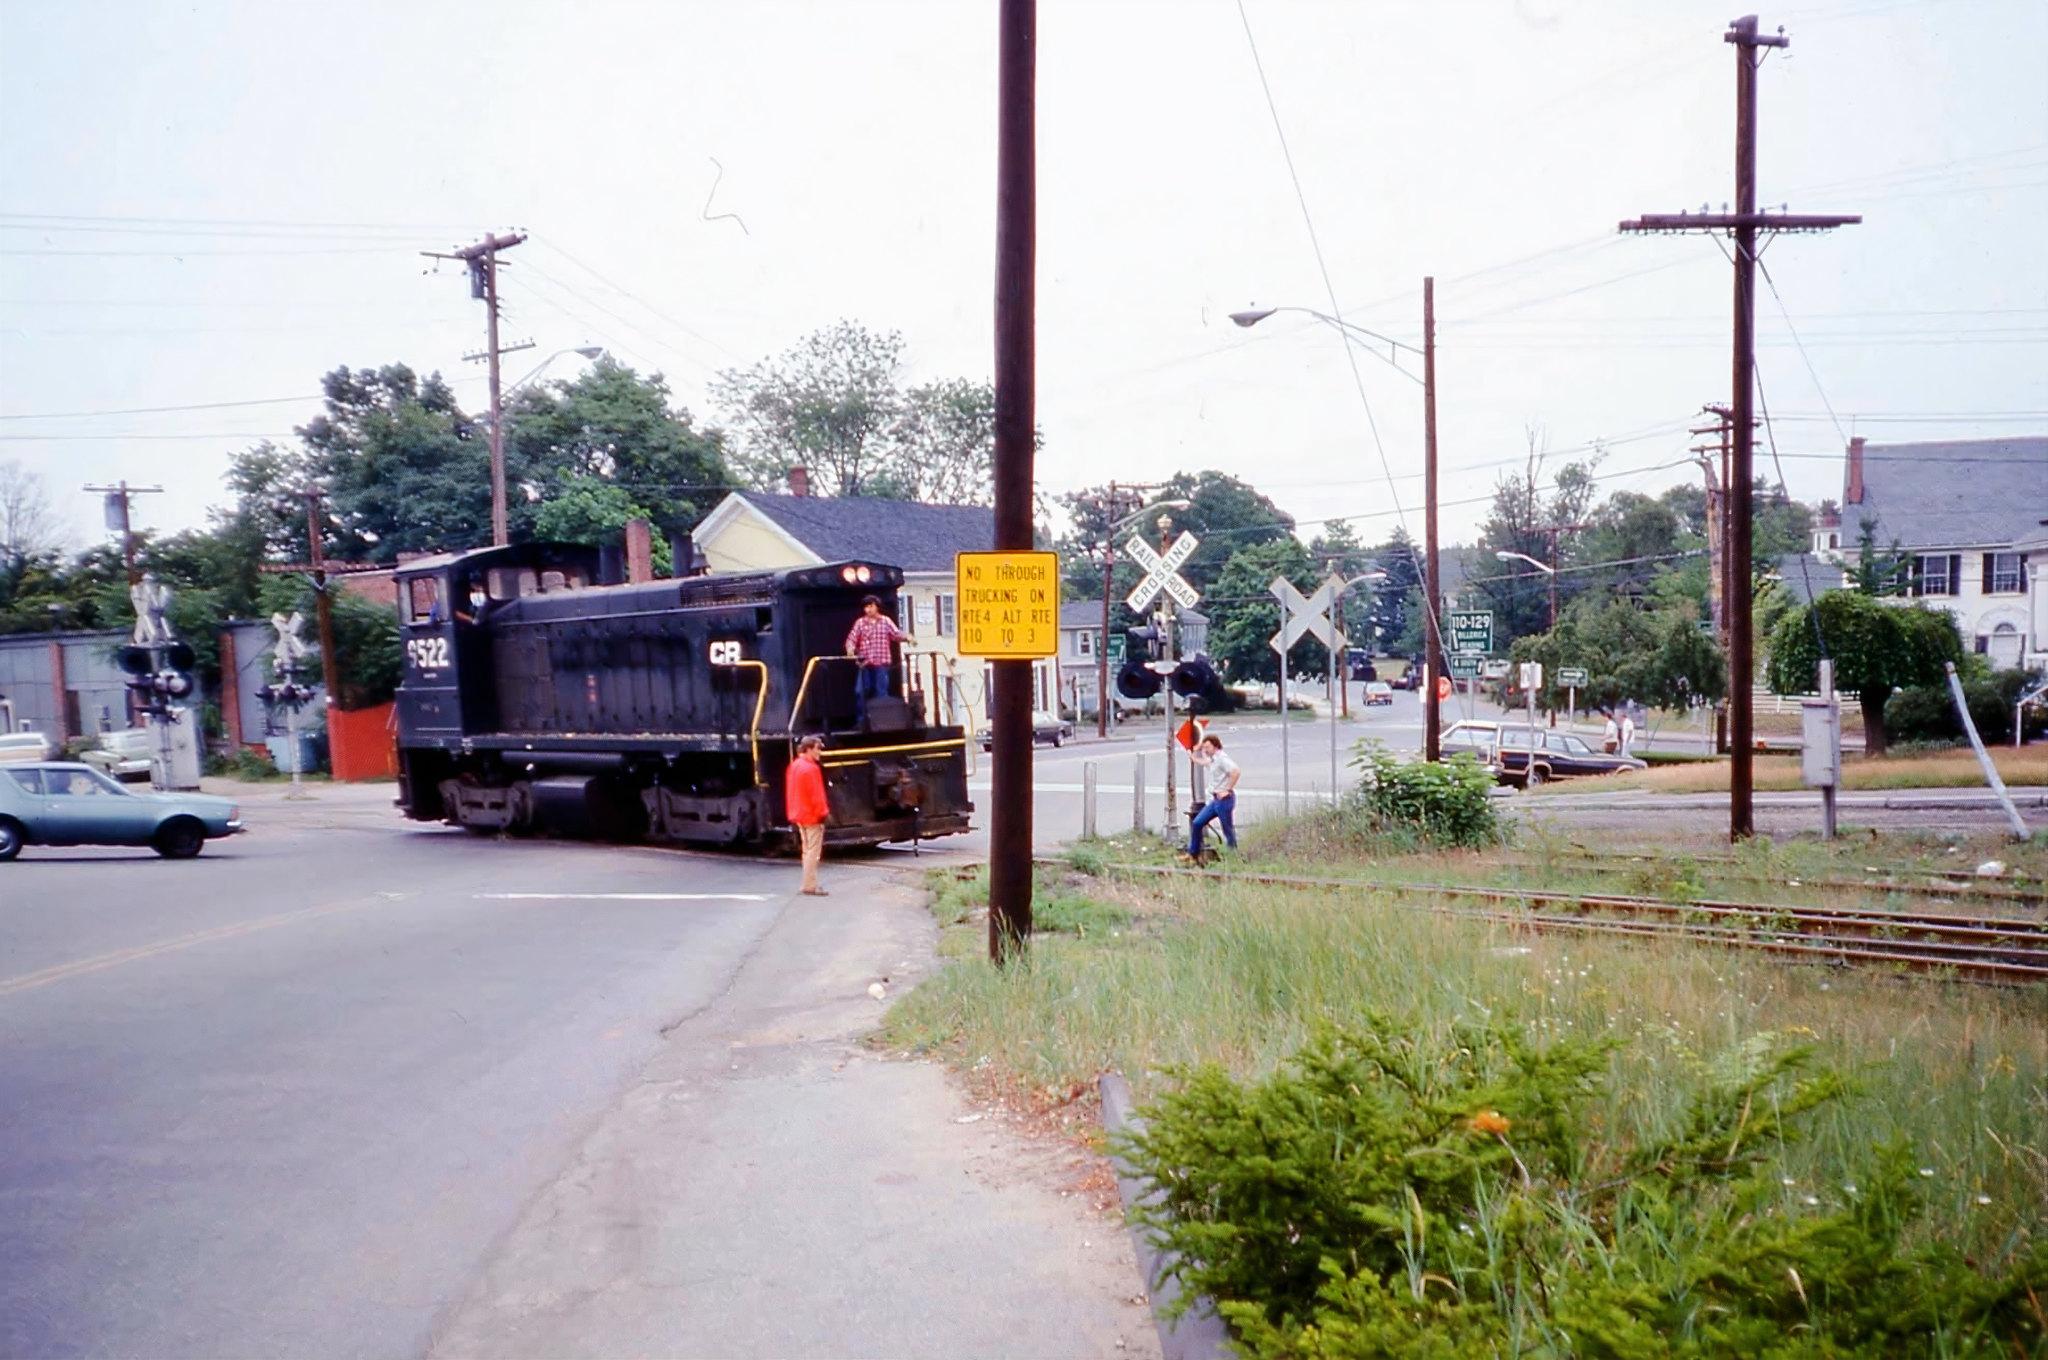 Framingham & Lowell Railroad (Summer 1977)